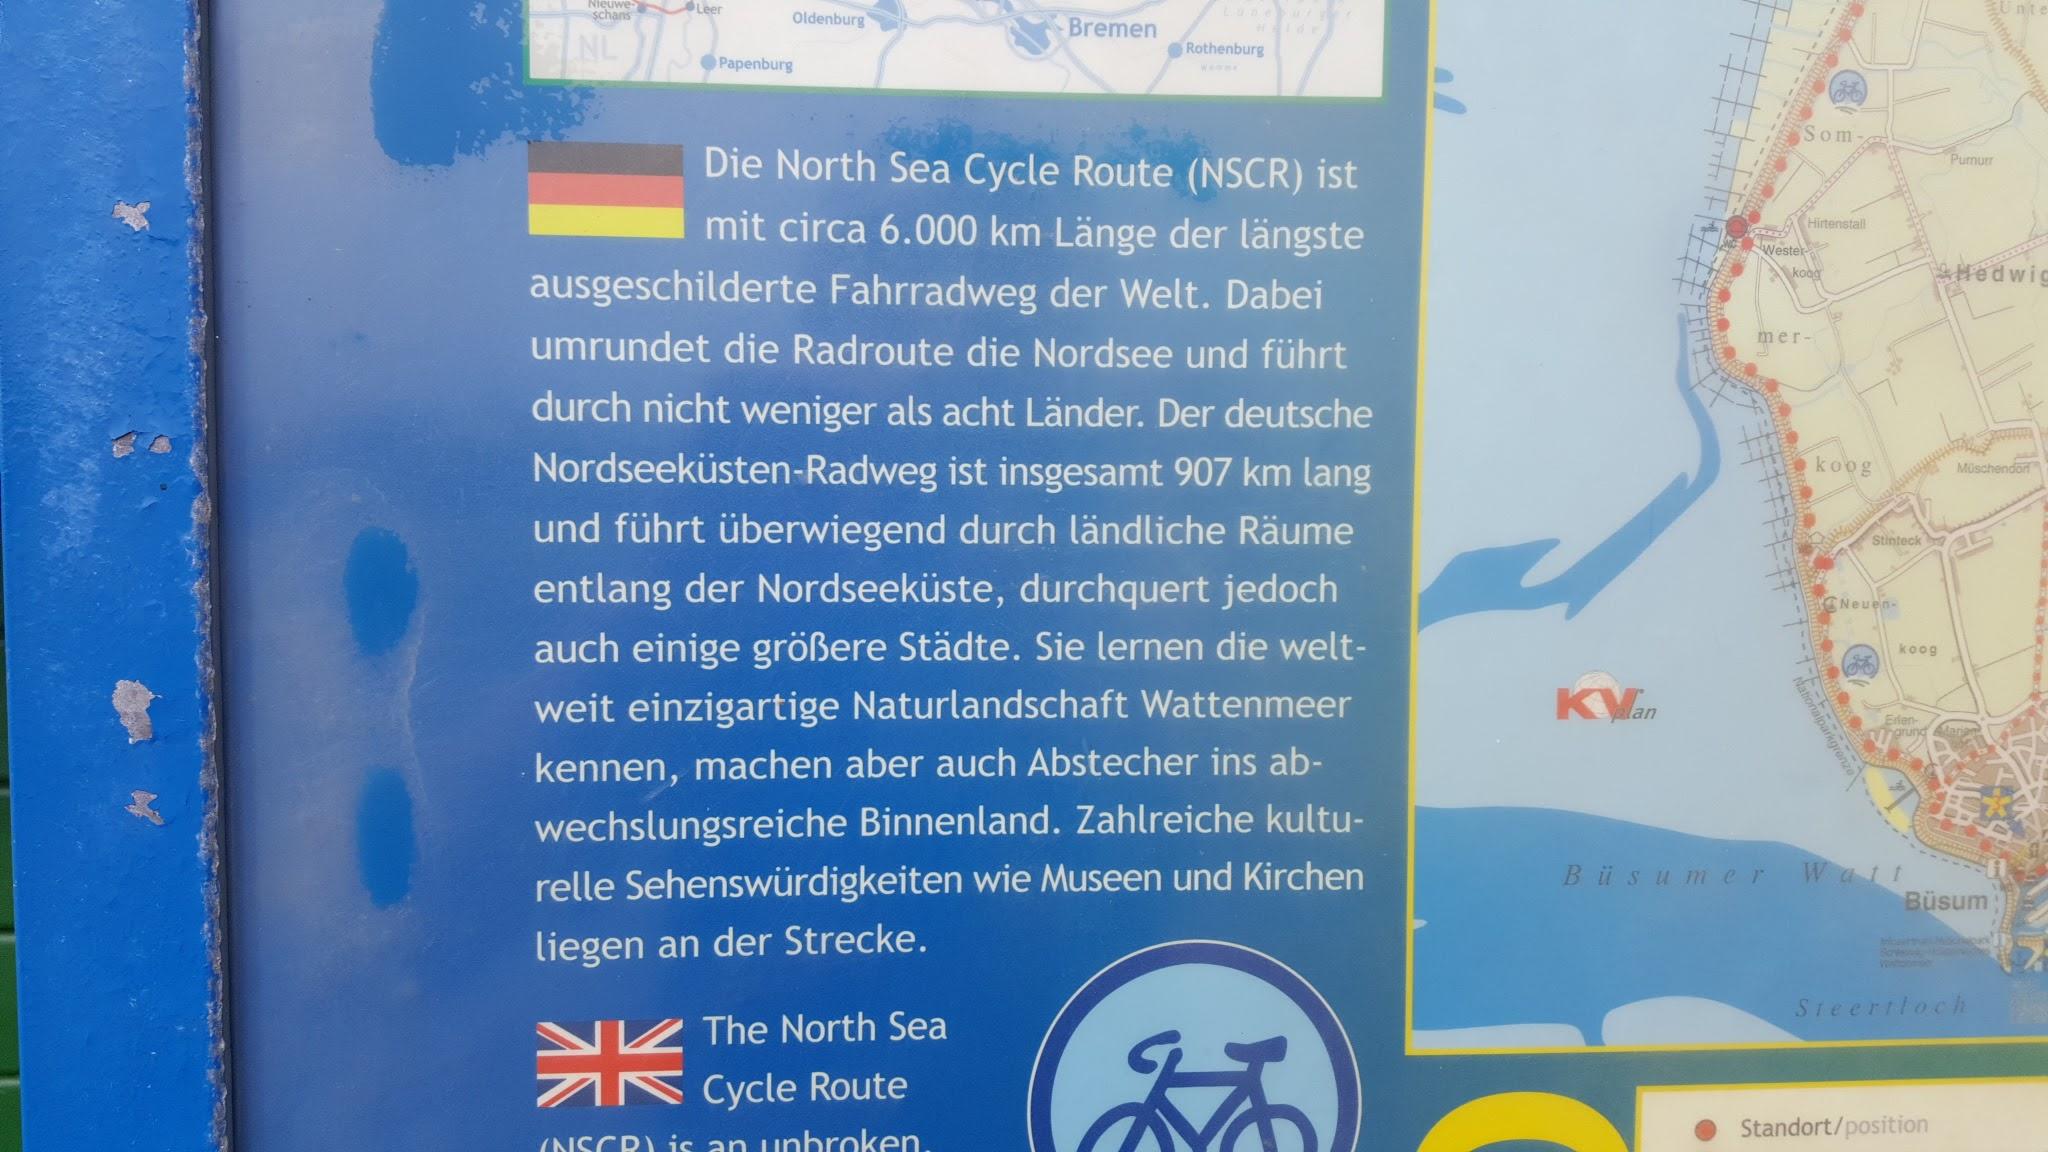 6000 km Radweg entlang der Nordseeküste